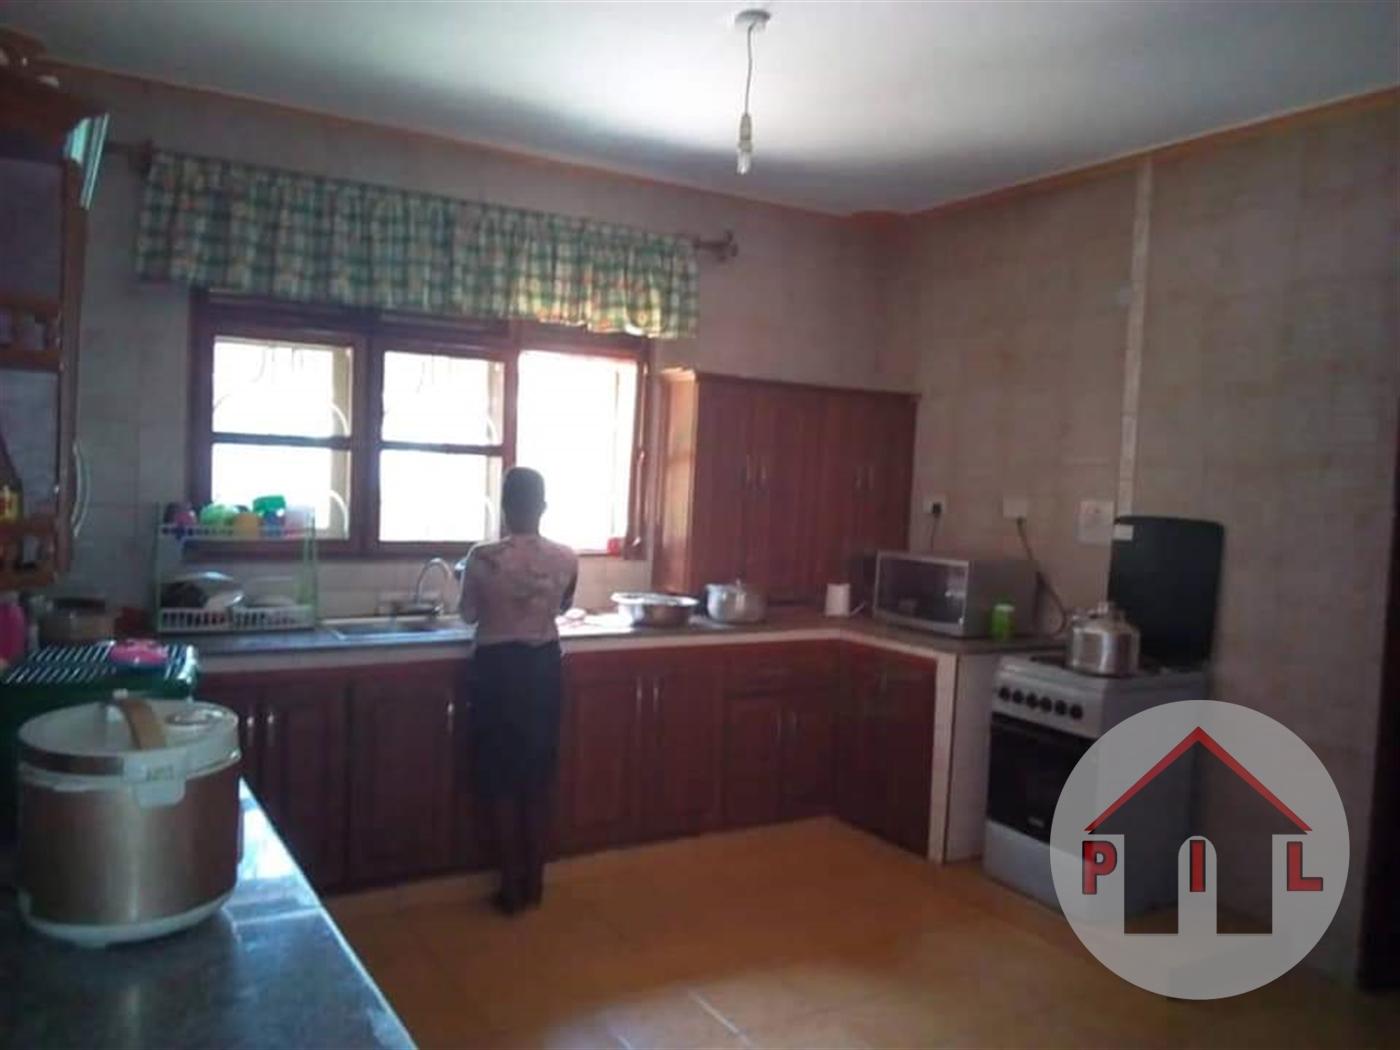 Storeyed house for sale in Katabi Wakiso